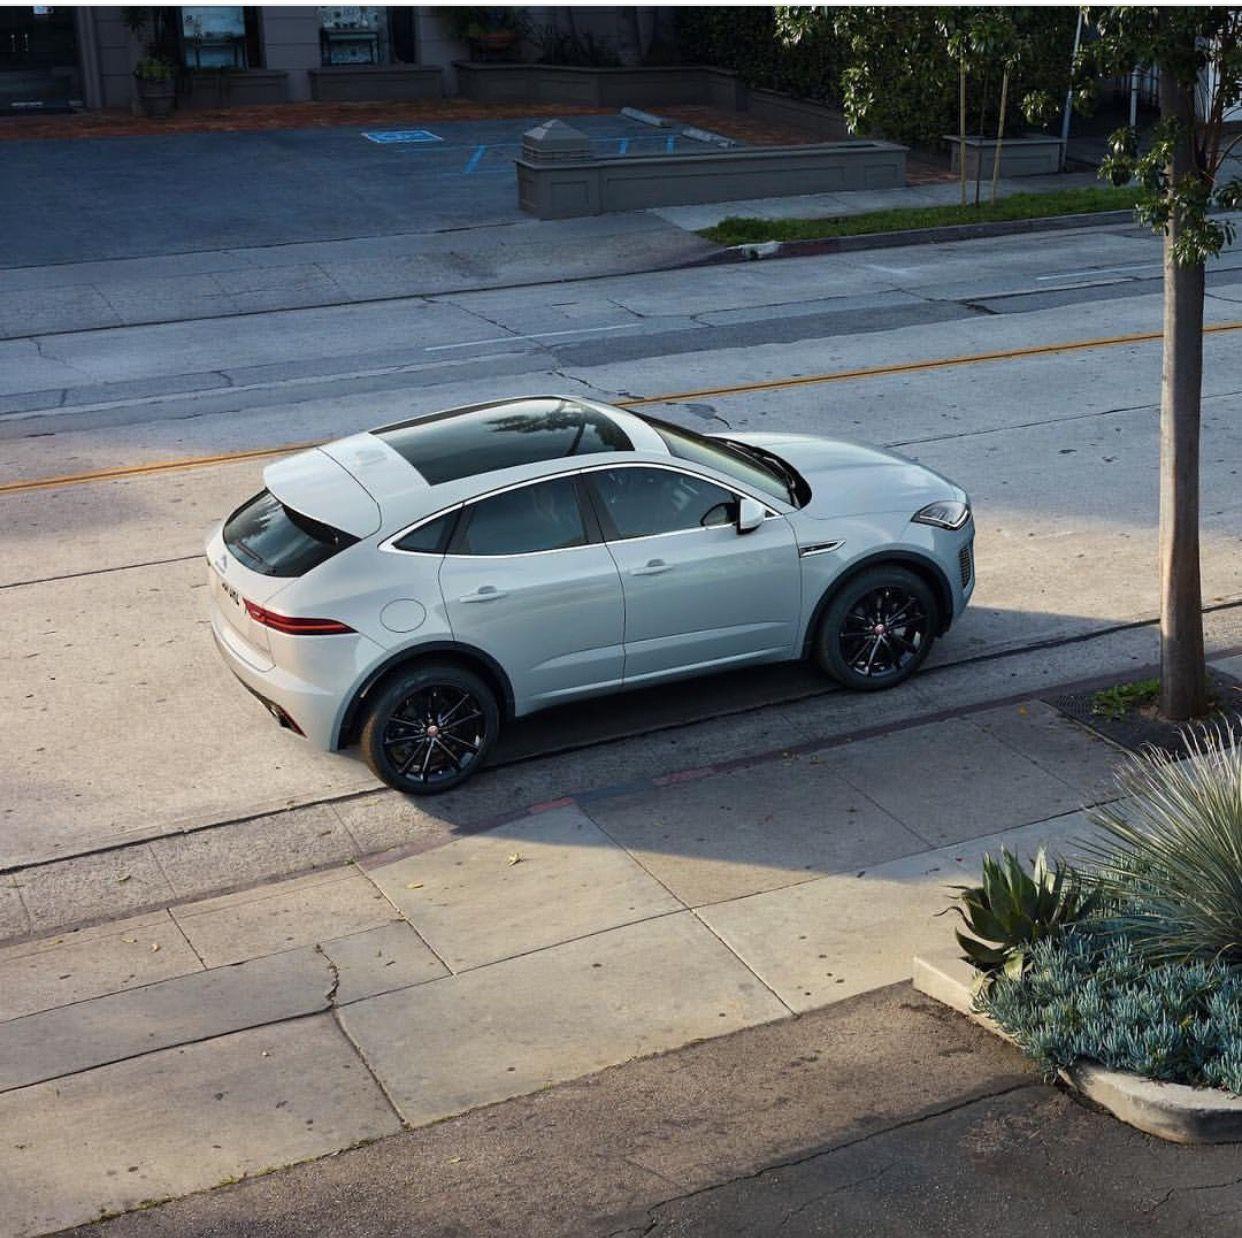 Super Cars, Premium Cars, Used Luxury Cars